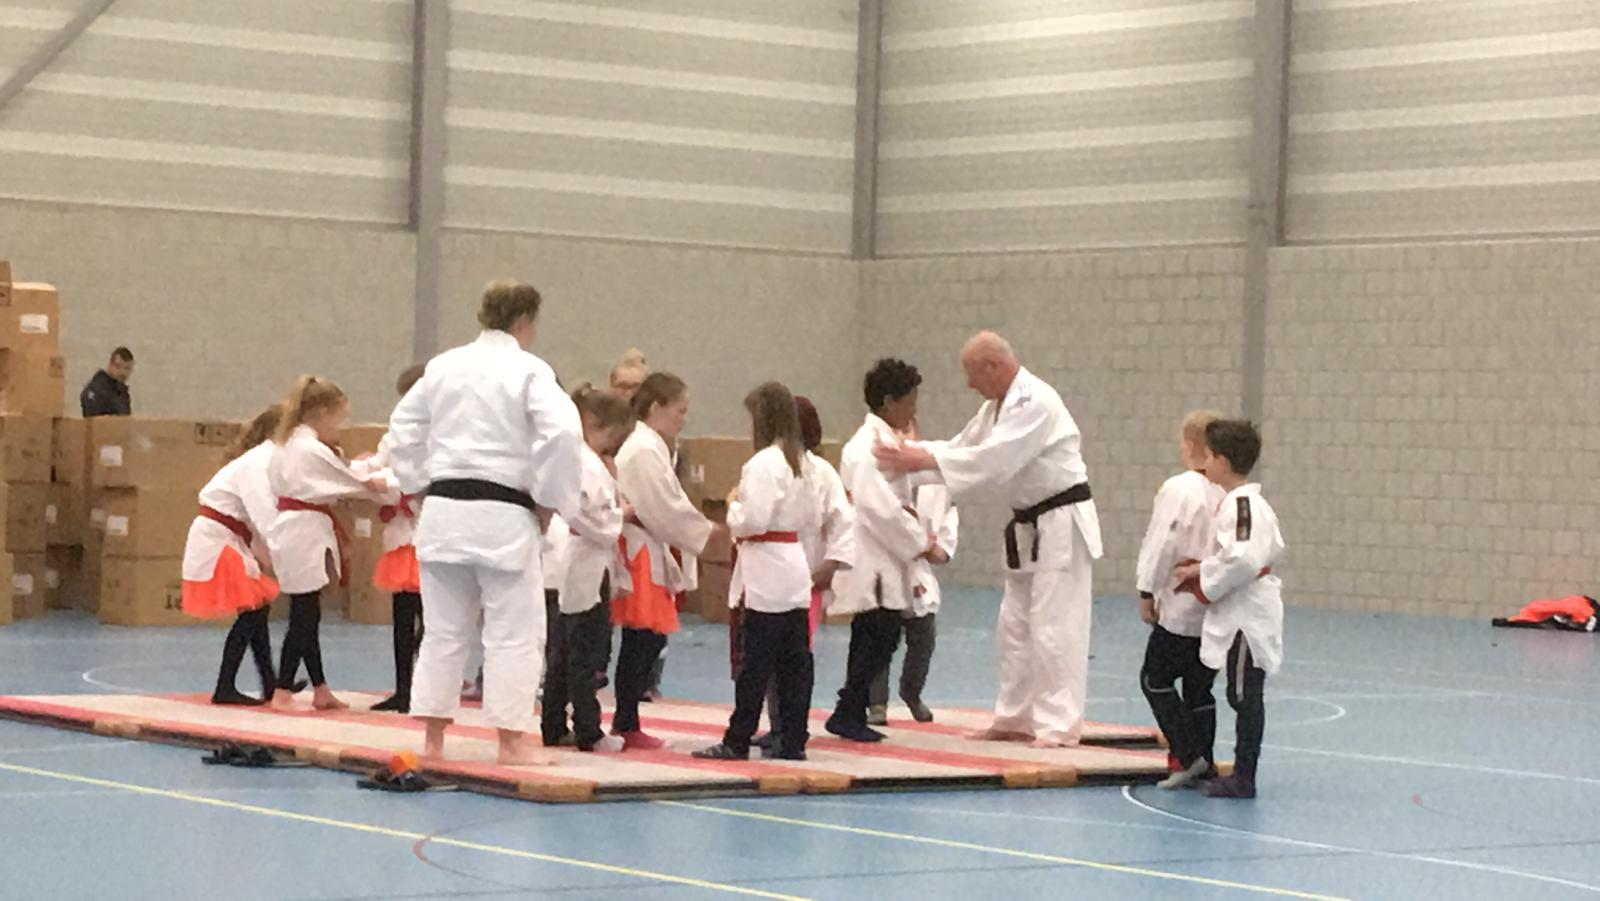 Judoclinics Koningspelen EBC De Regenboog